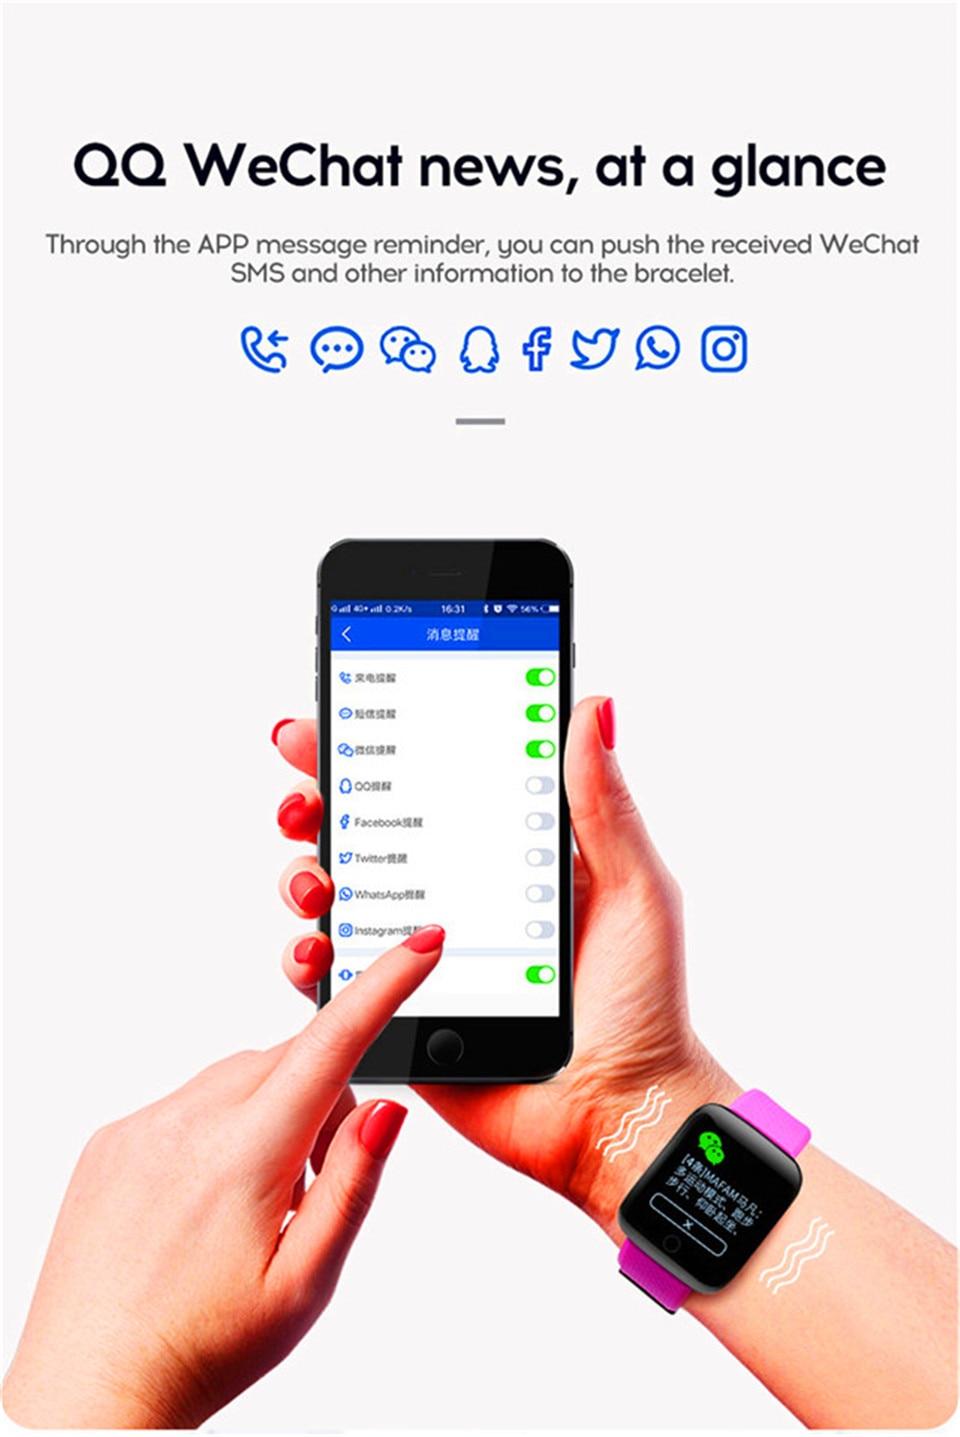 HTB1KgqSO9zqK1RjSZPcq6zTepXaa Smart Wristband Heart Rate Monitor Smart Fitness Bracelet Blood Pressure Waterproof IP67 Fitness Tracker Watch For Women Men